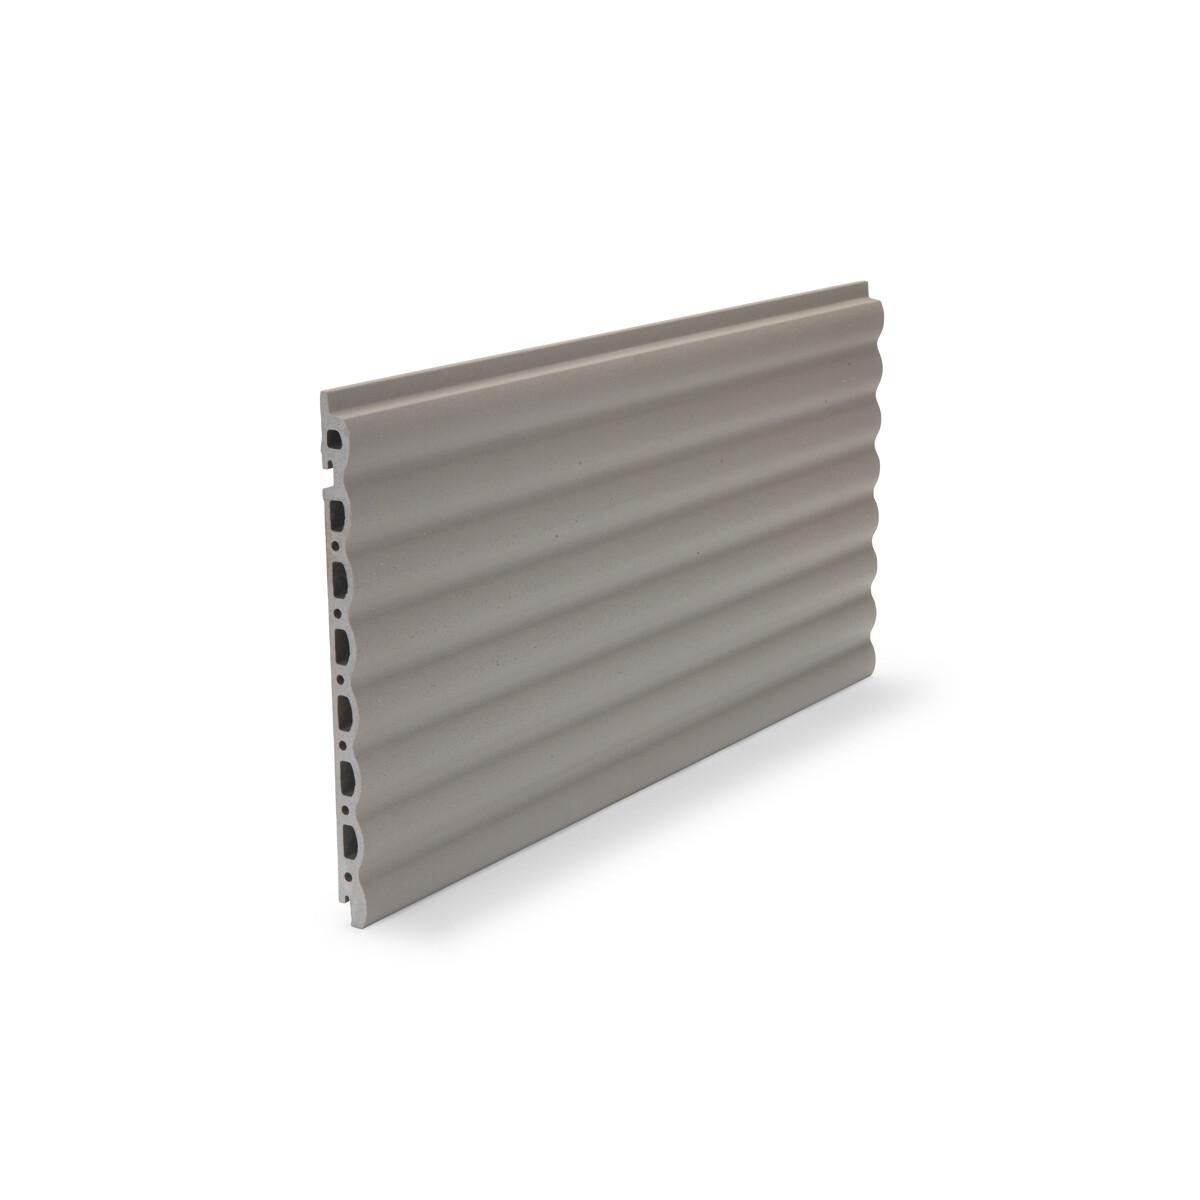 FK-O 8/20  - Ventilated Facade Elements